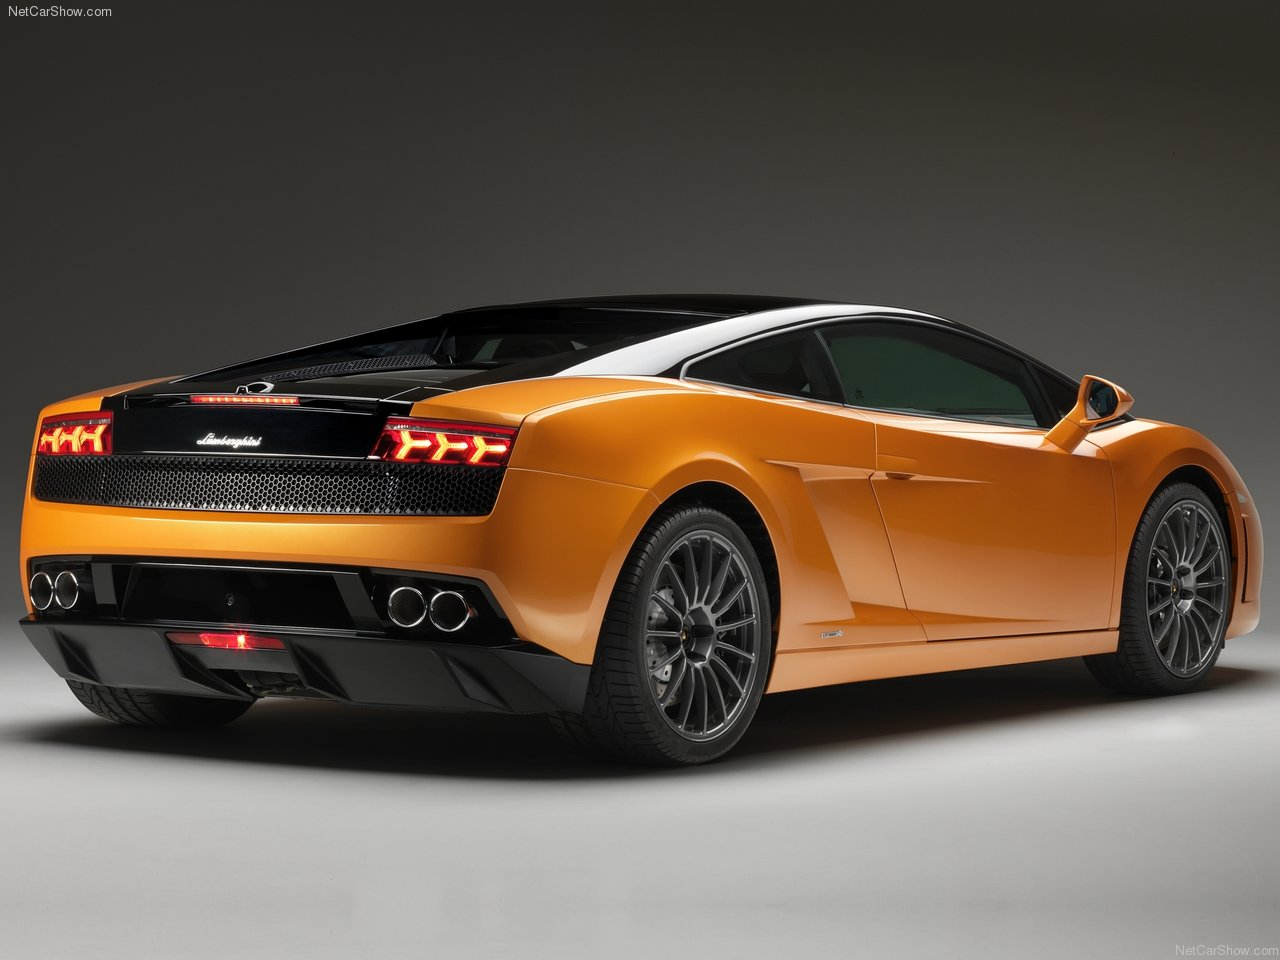 Image Result For Lamborghini Gallardo Wallpaper